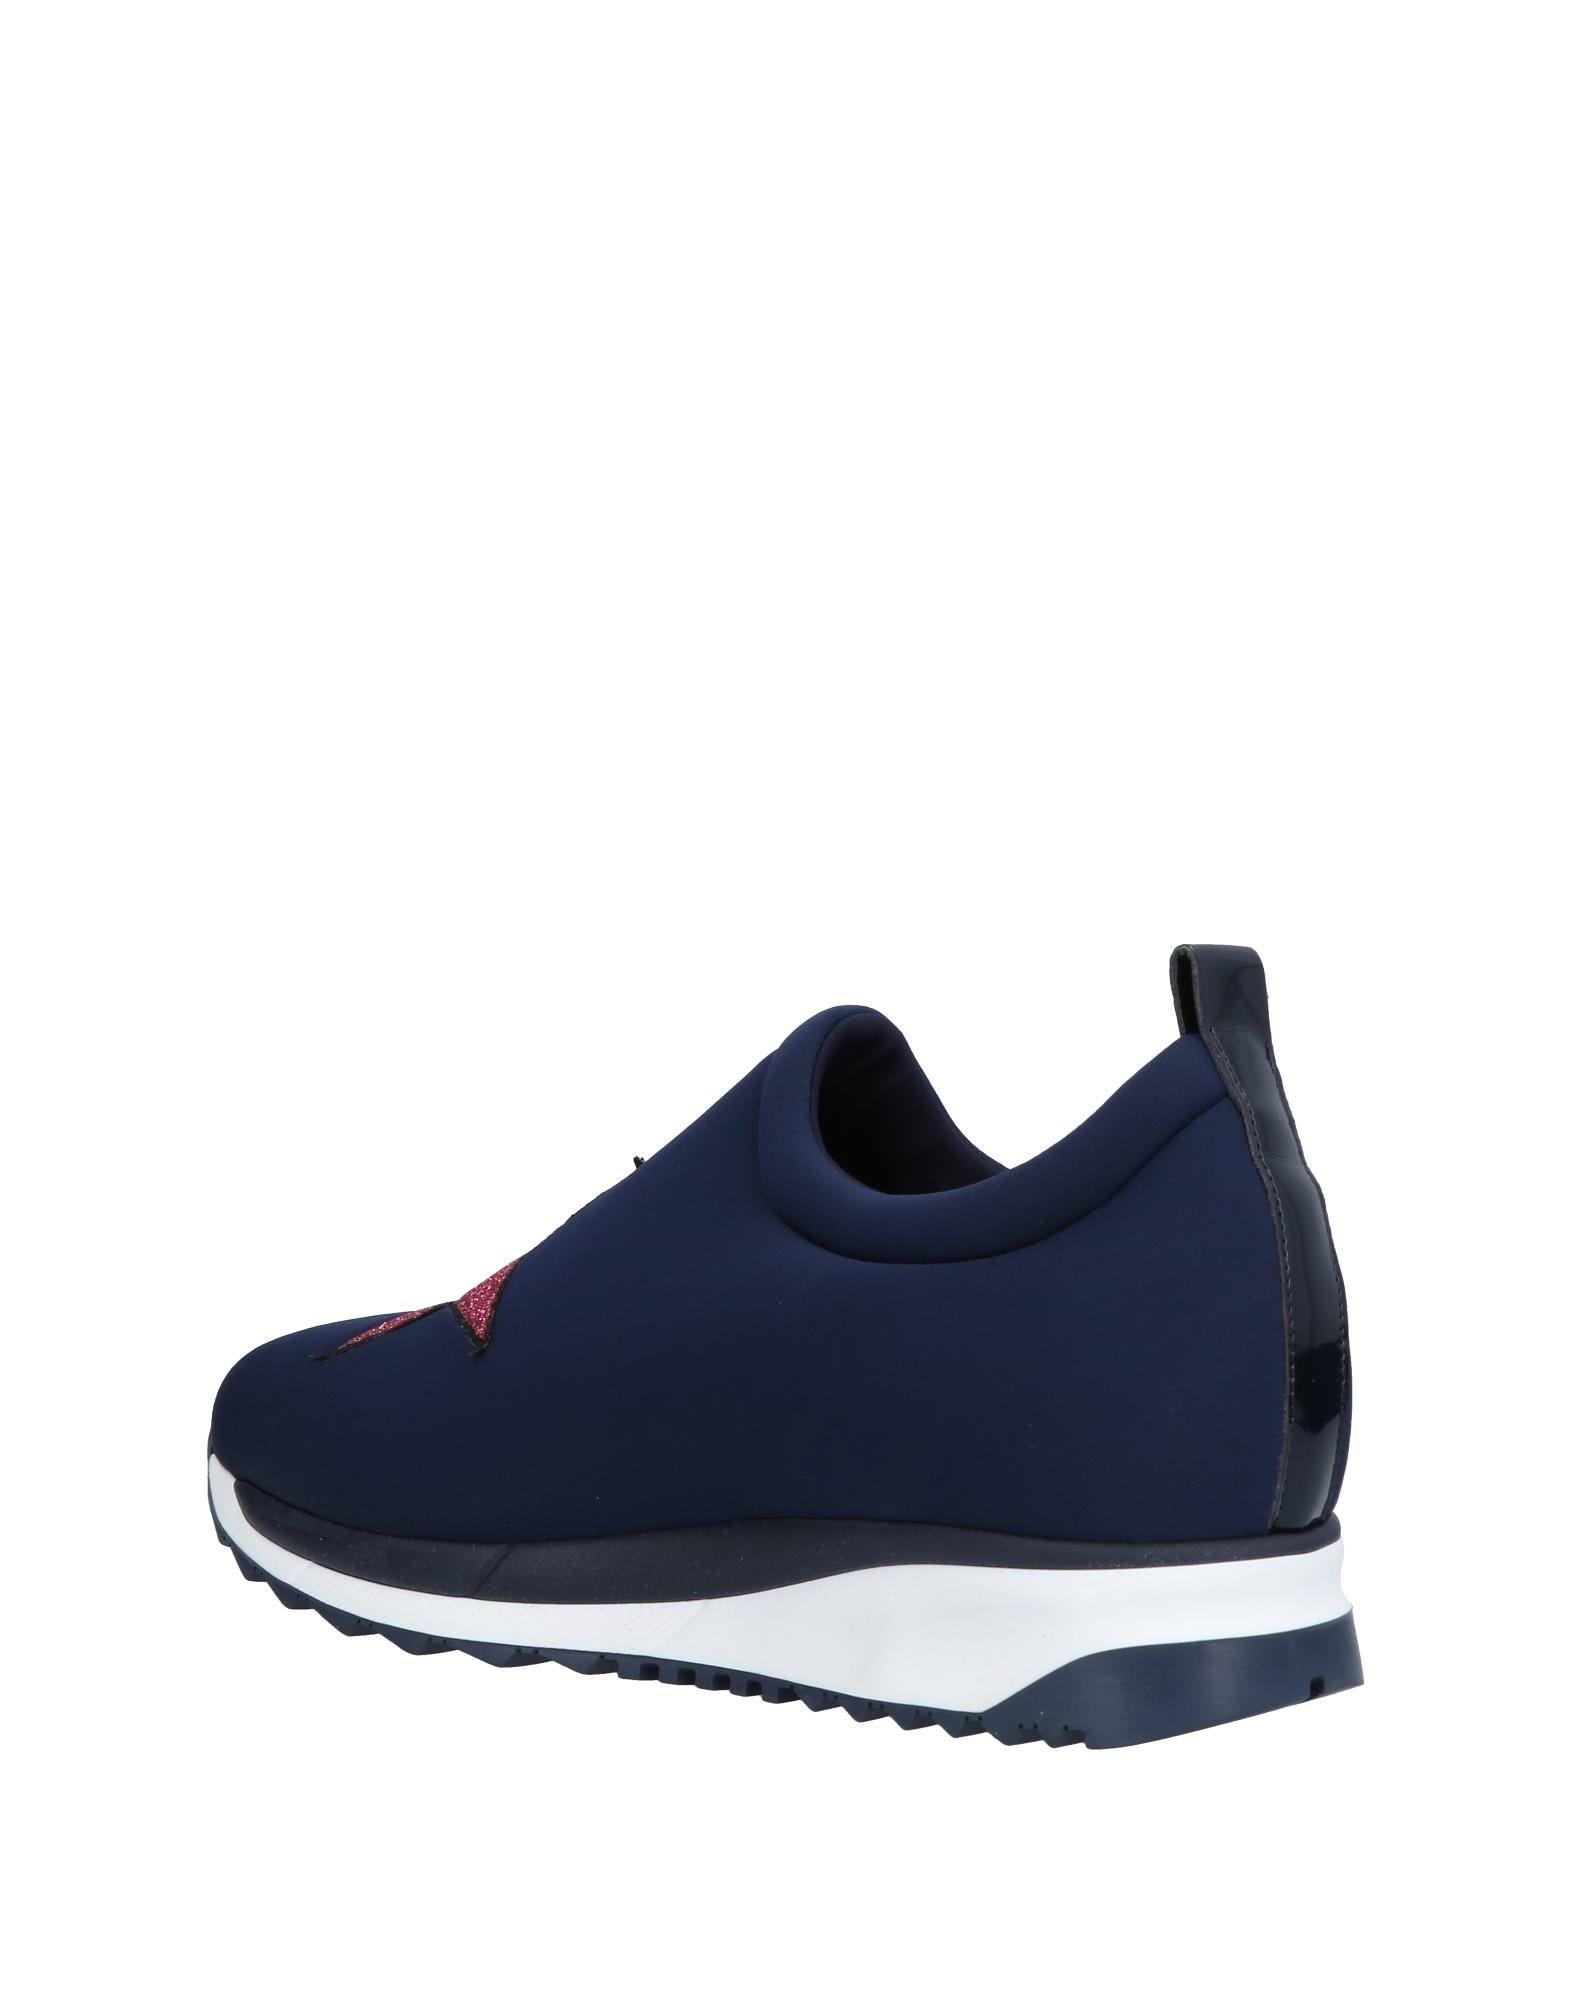 Stilvolle billige Schuhe Atos 11492839XX Lombardini Sneakers Damen  11492839XX Atos dcefd5